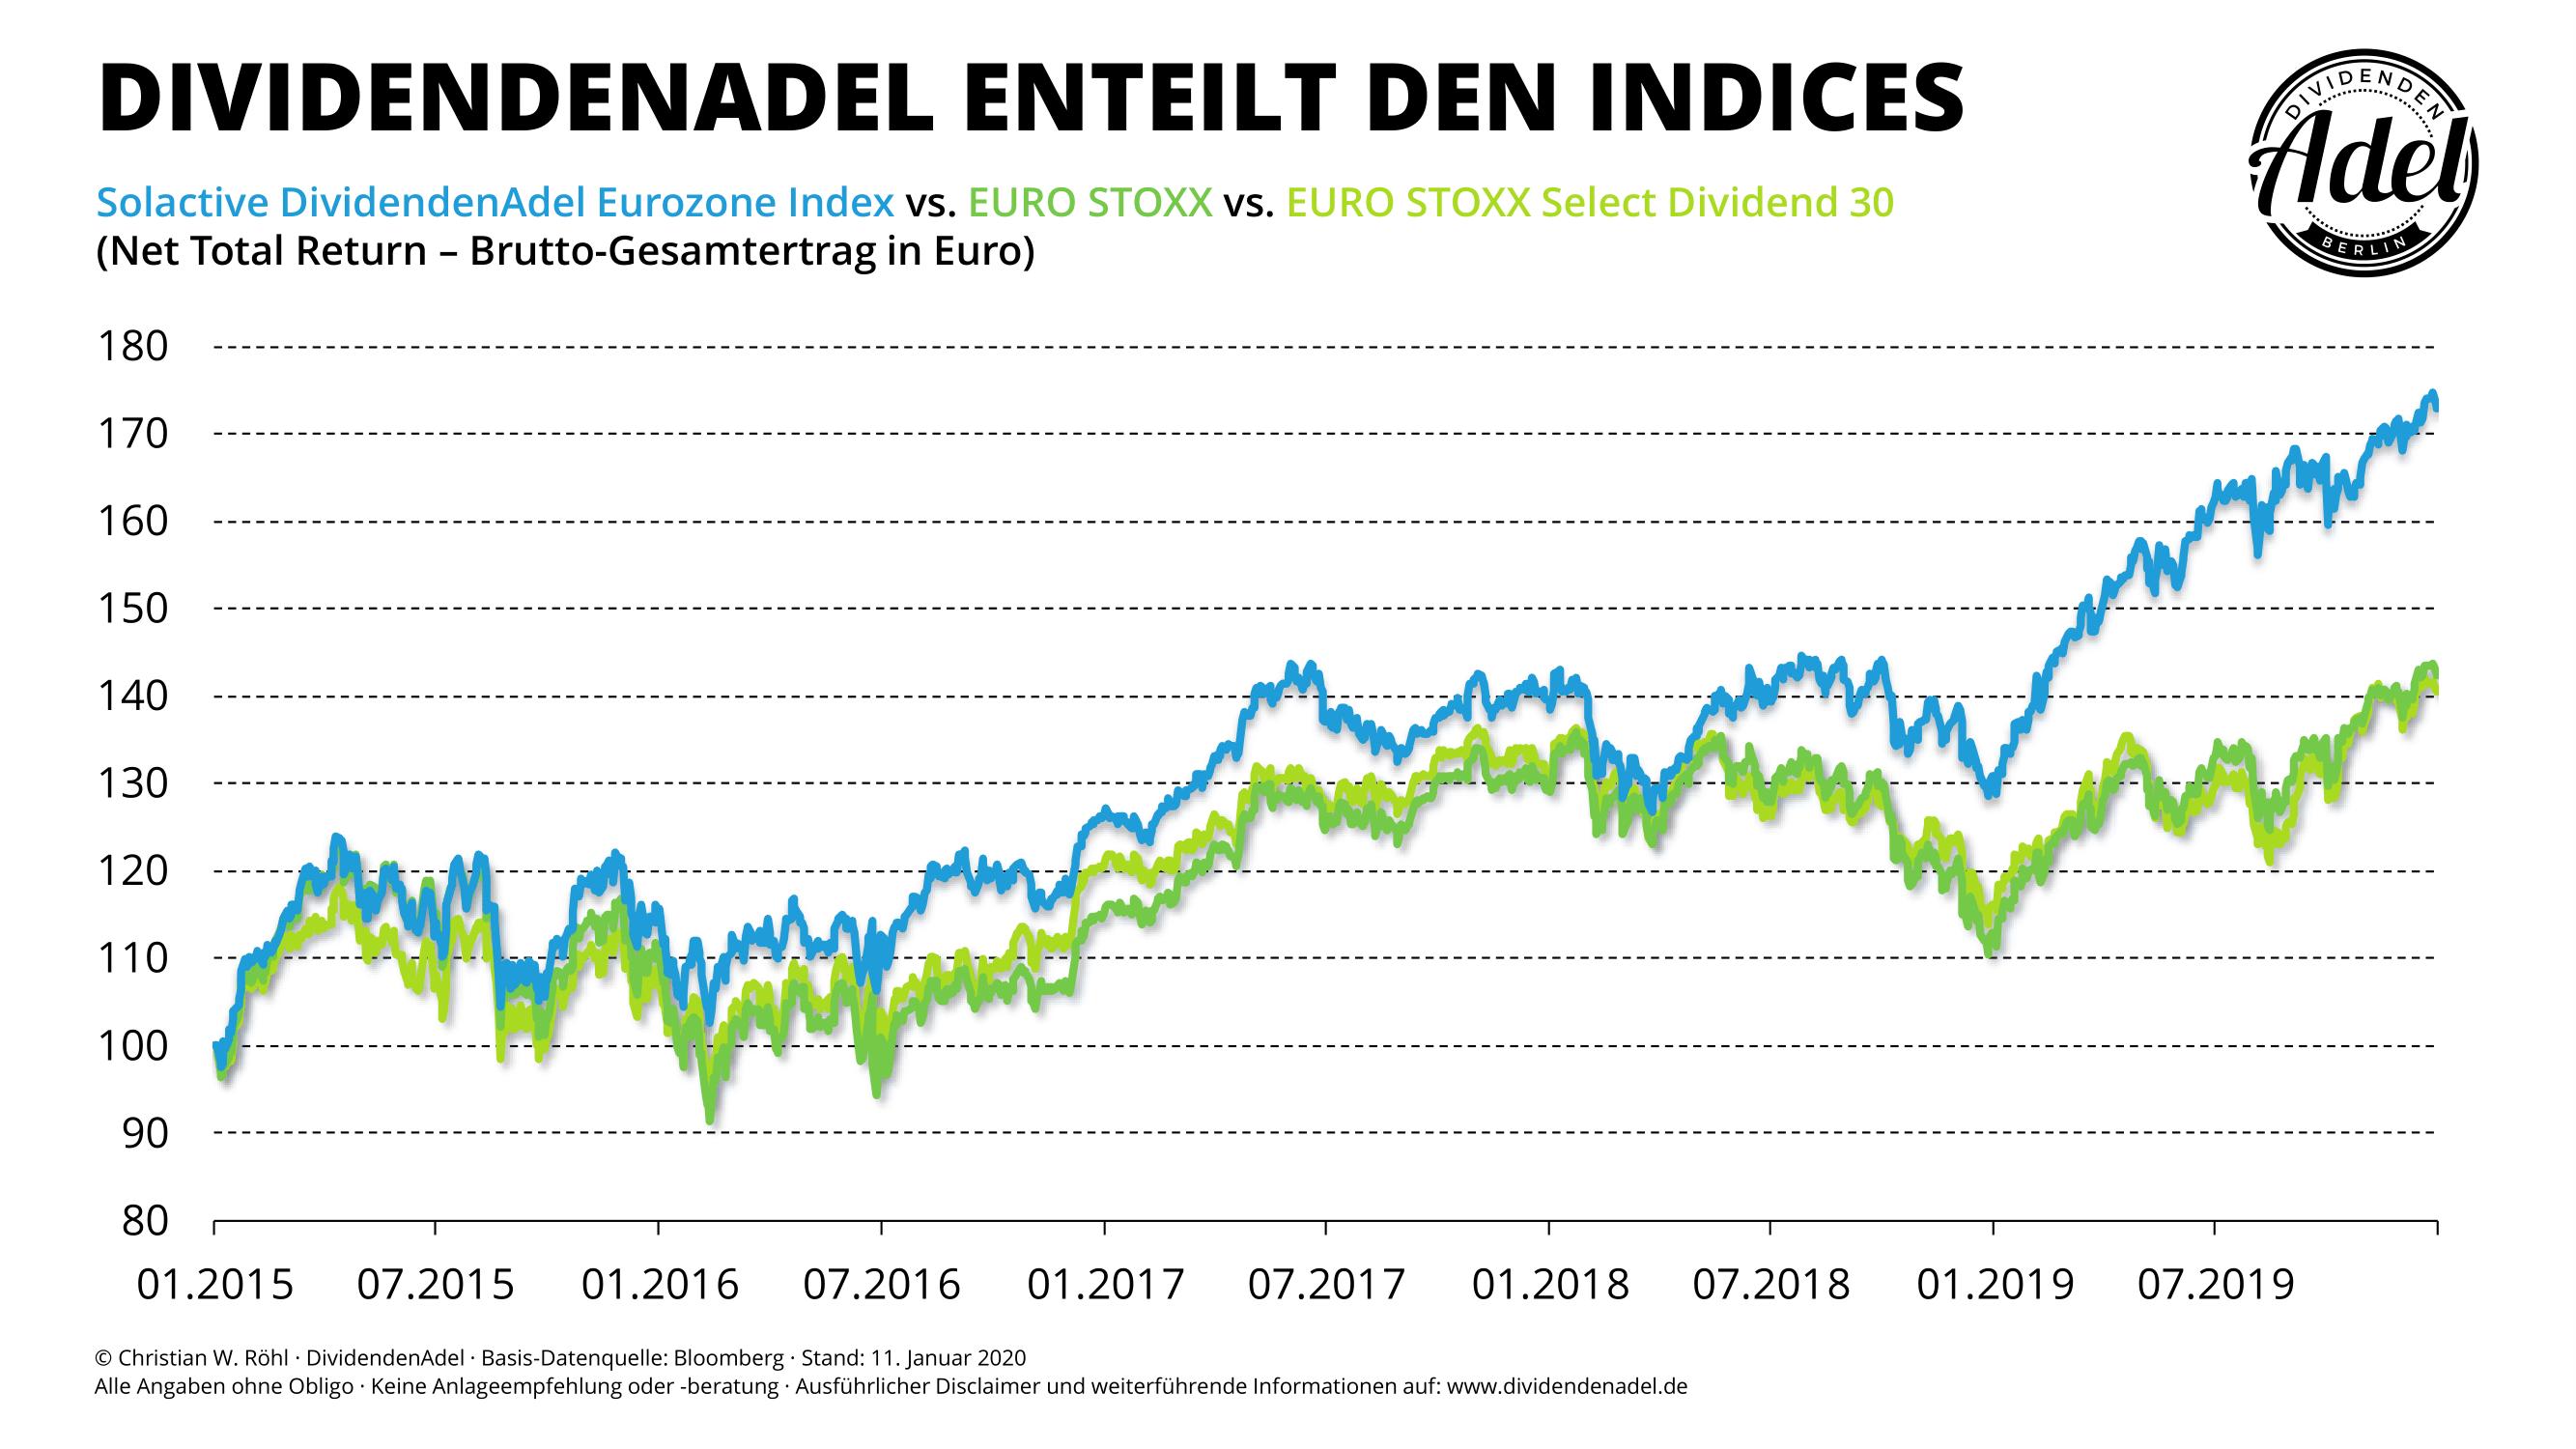 DividendenAdel Eurozone vs. EURO STOXX seit 2015